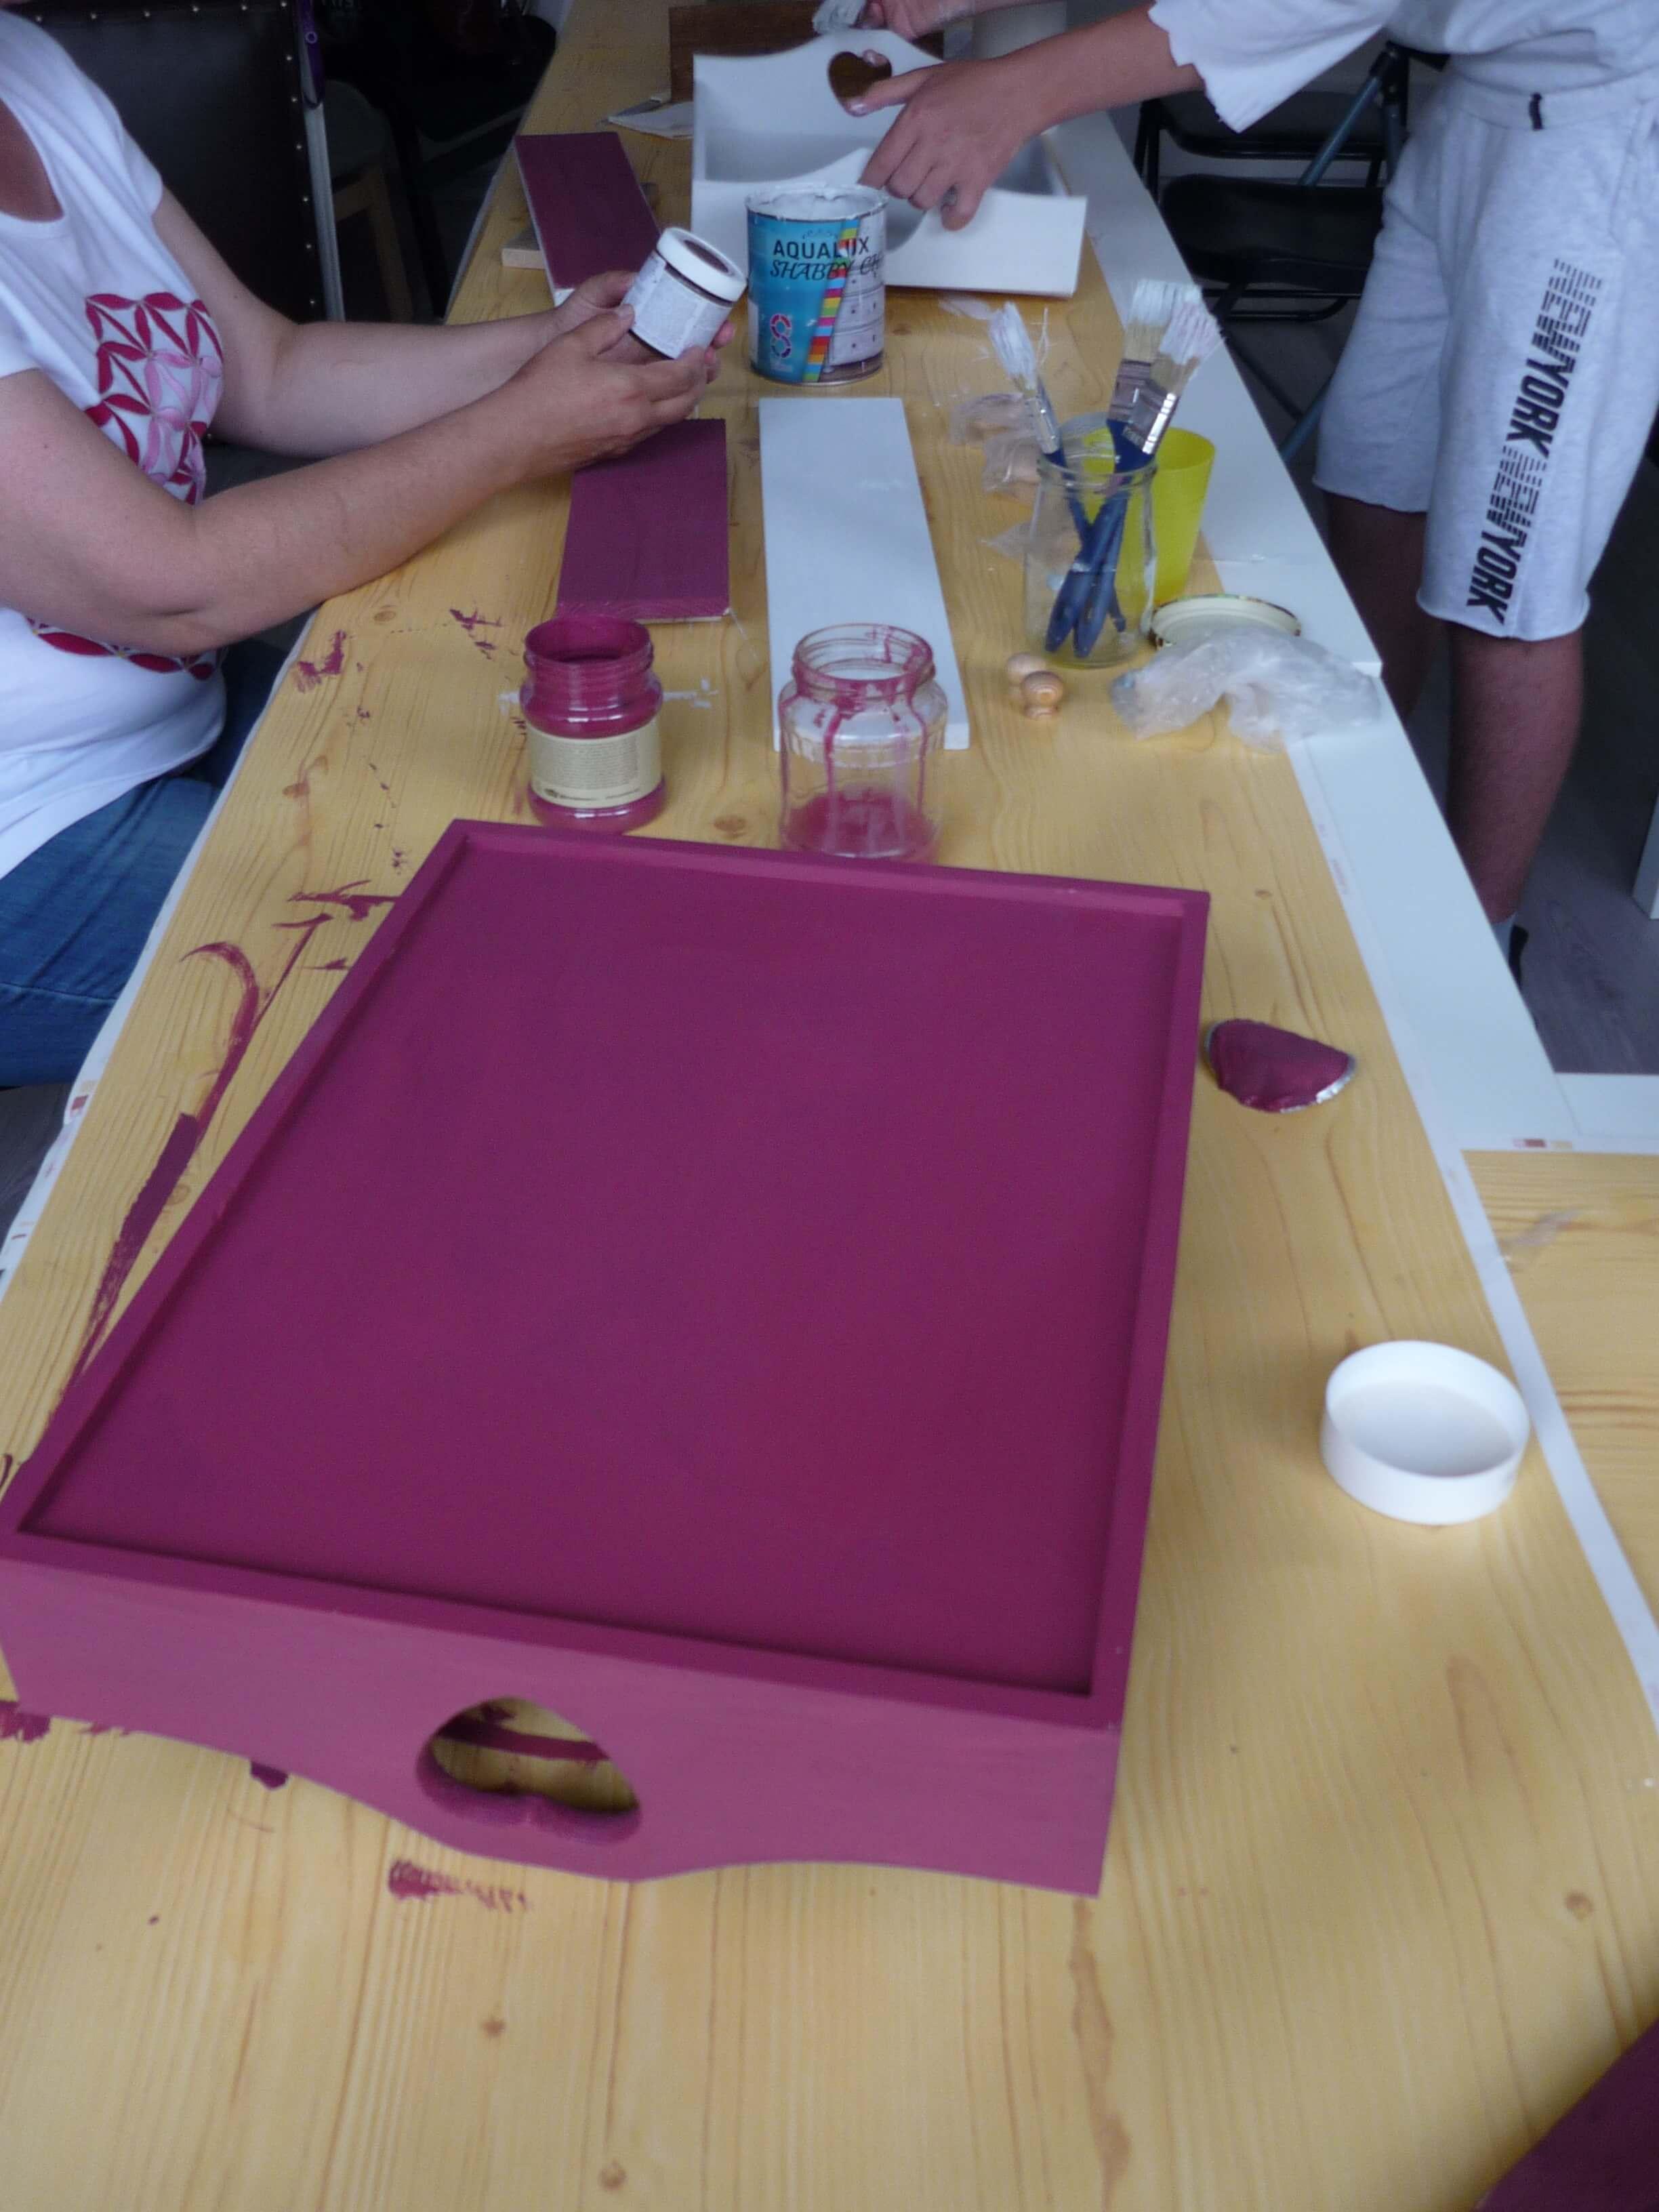 1.Workshop s Kriedovymi Farbamy VK (7).JPG